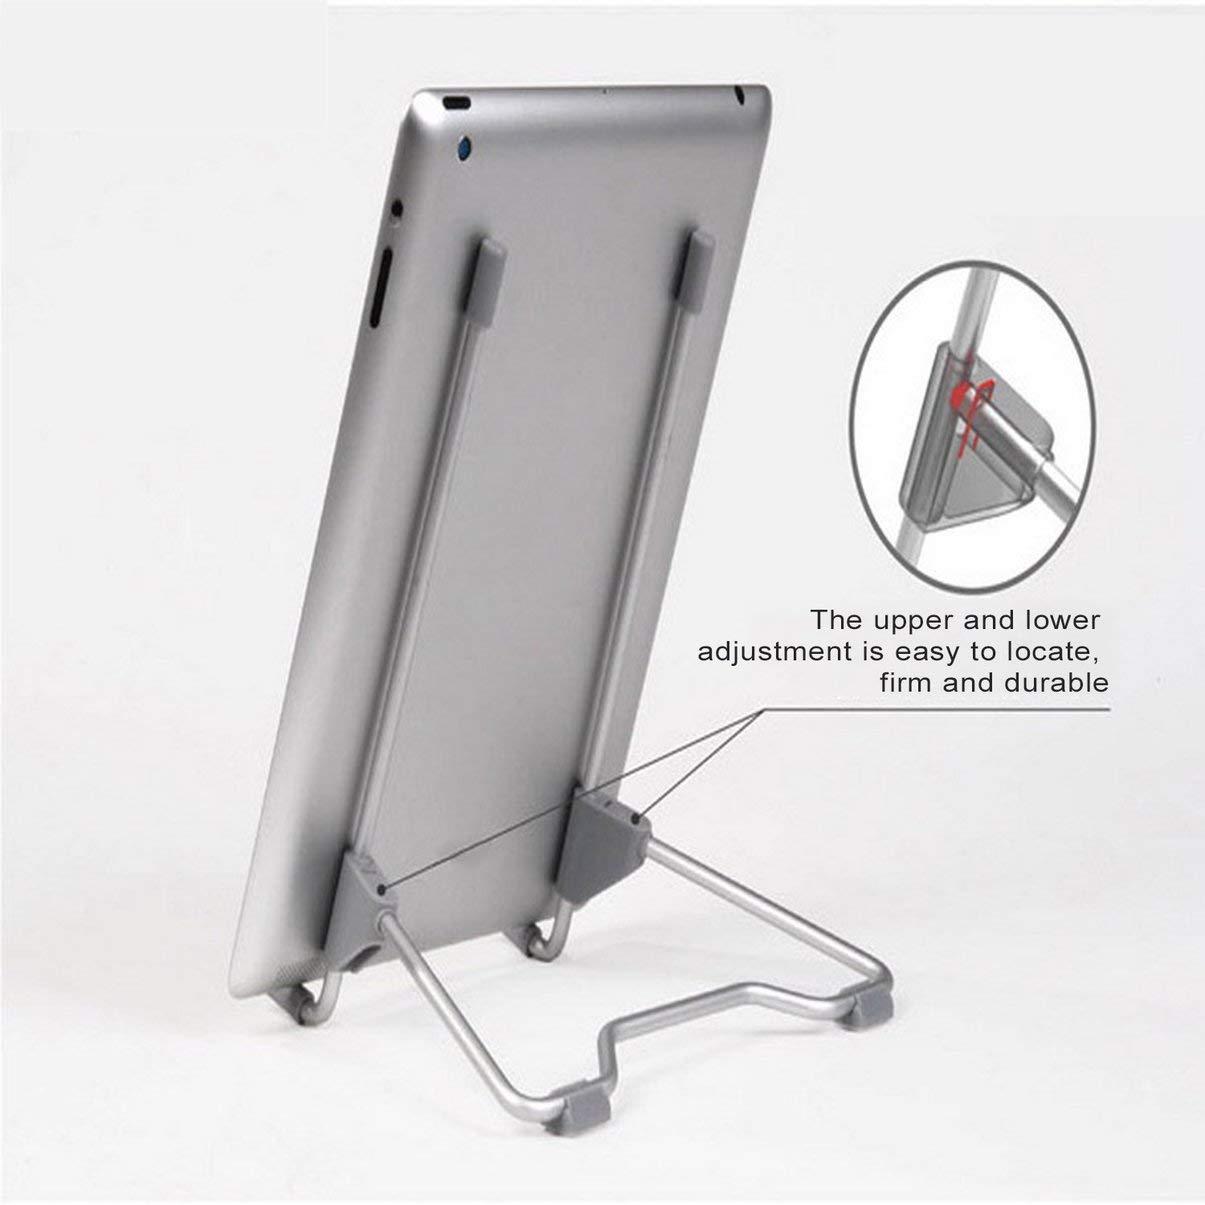 Multifunctional Folding Portable Tablet PC Laptop Stand Universal Adjustable Desktop Computer Support Bracket Aluminum Alloy